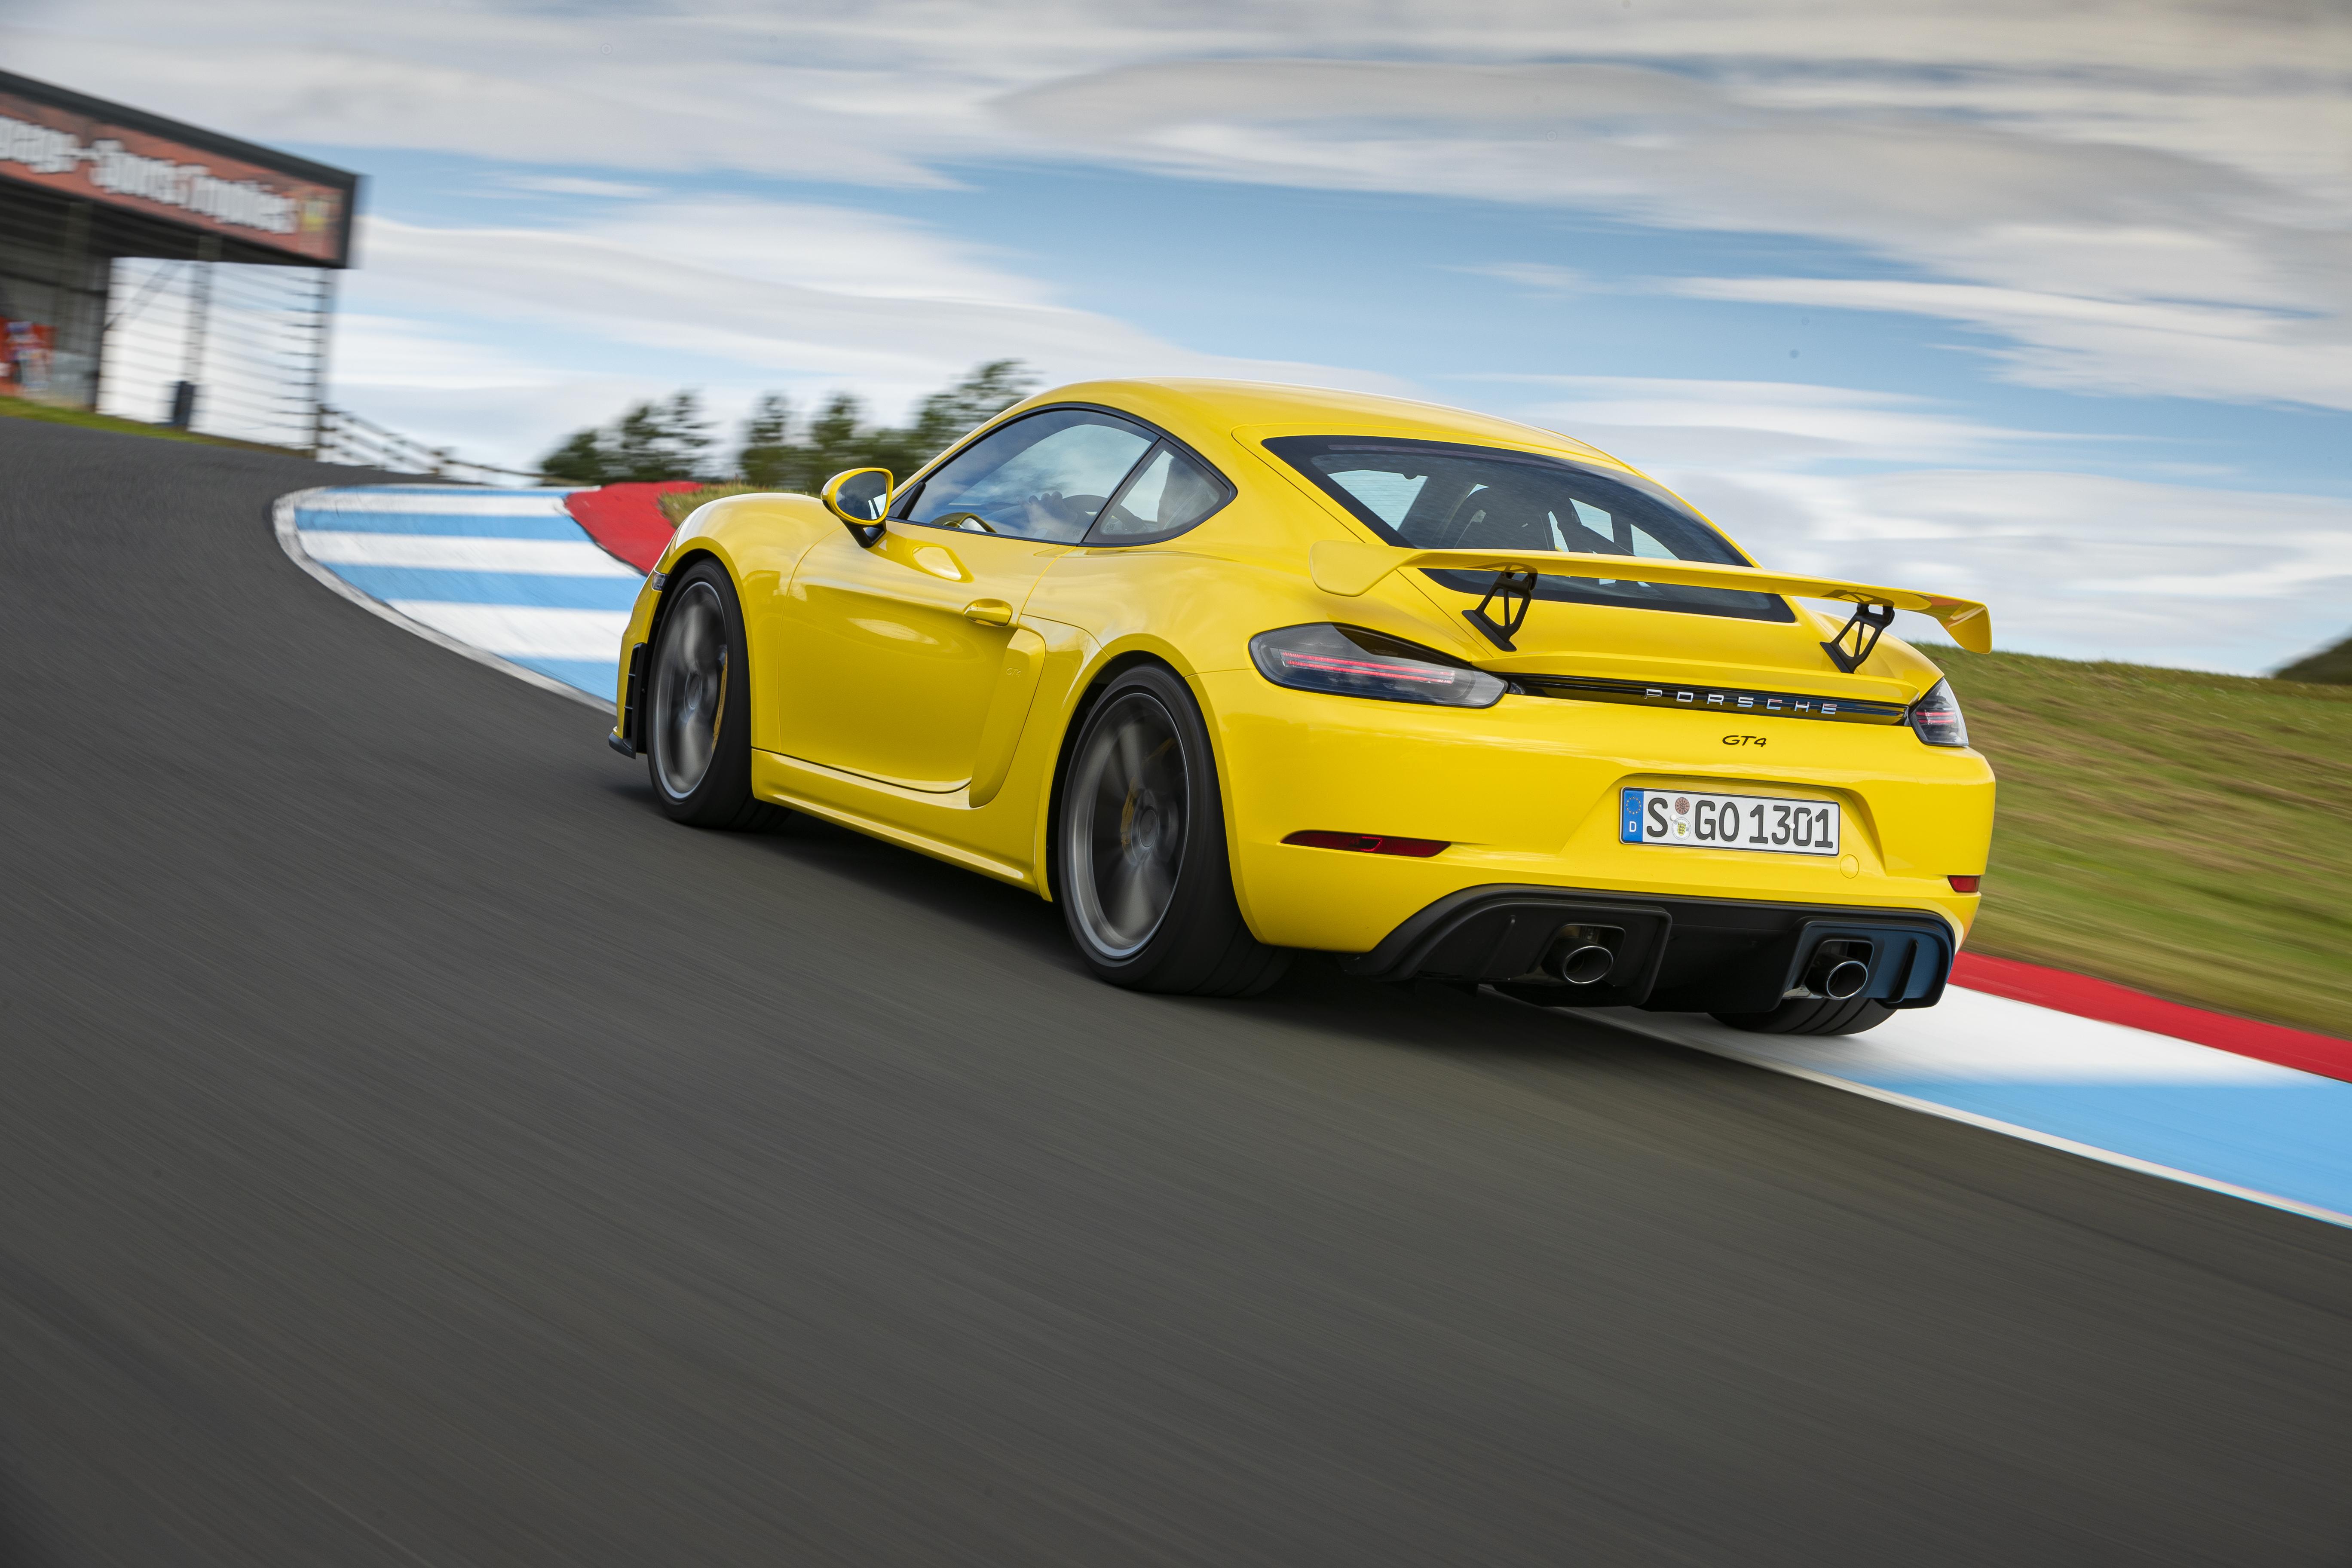 Porsche Cayman GT4 rear dynamic